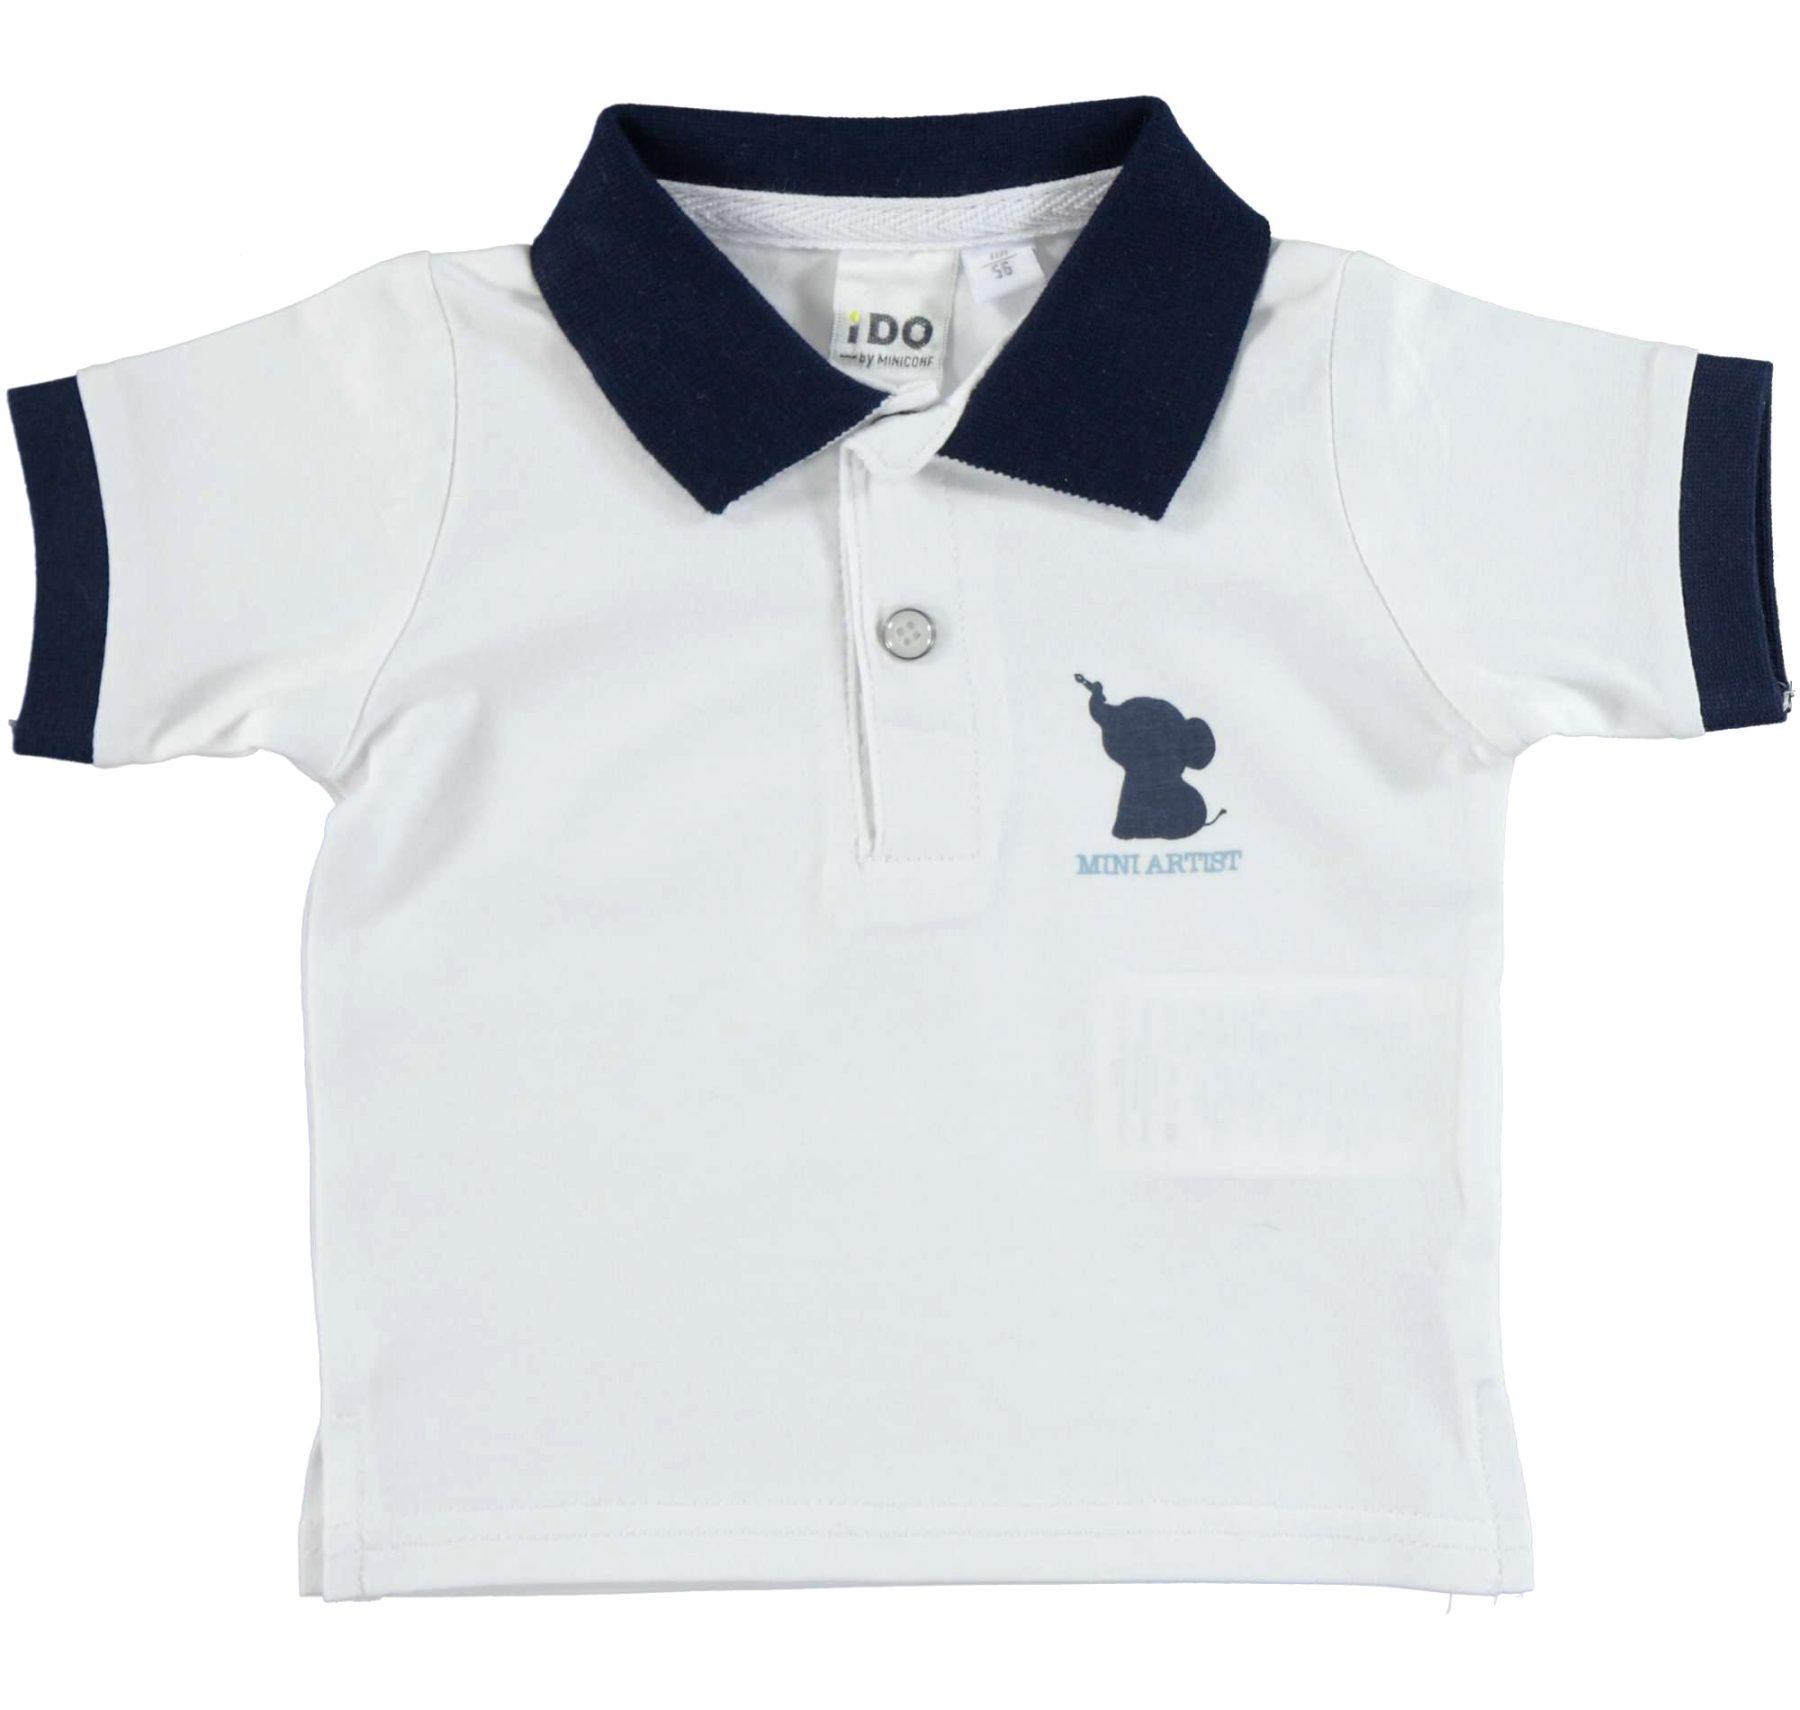 Ido Navy And White Elephant Logo Polo Tirt Donna Louise